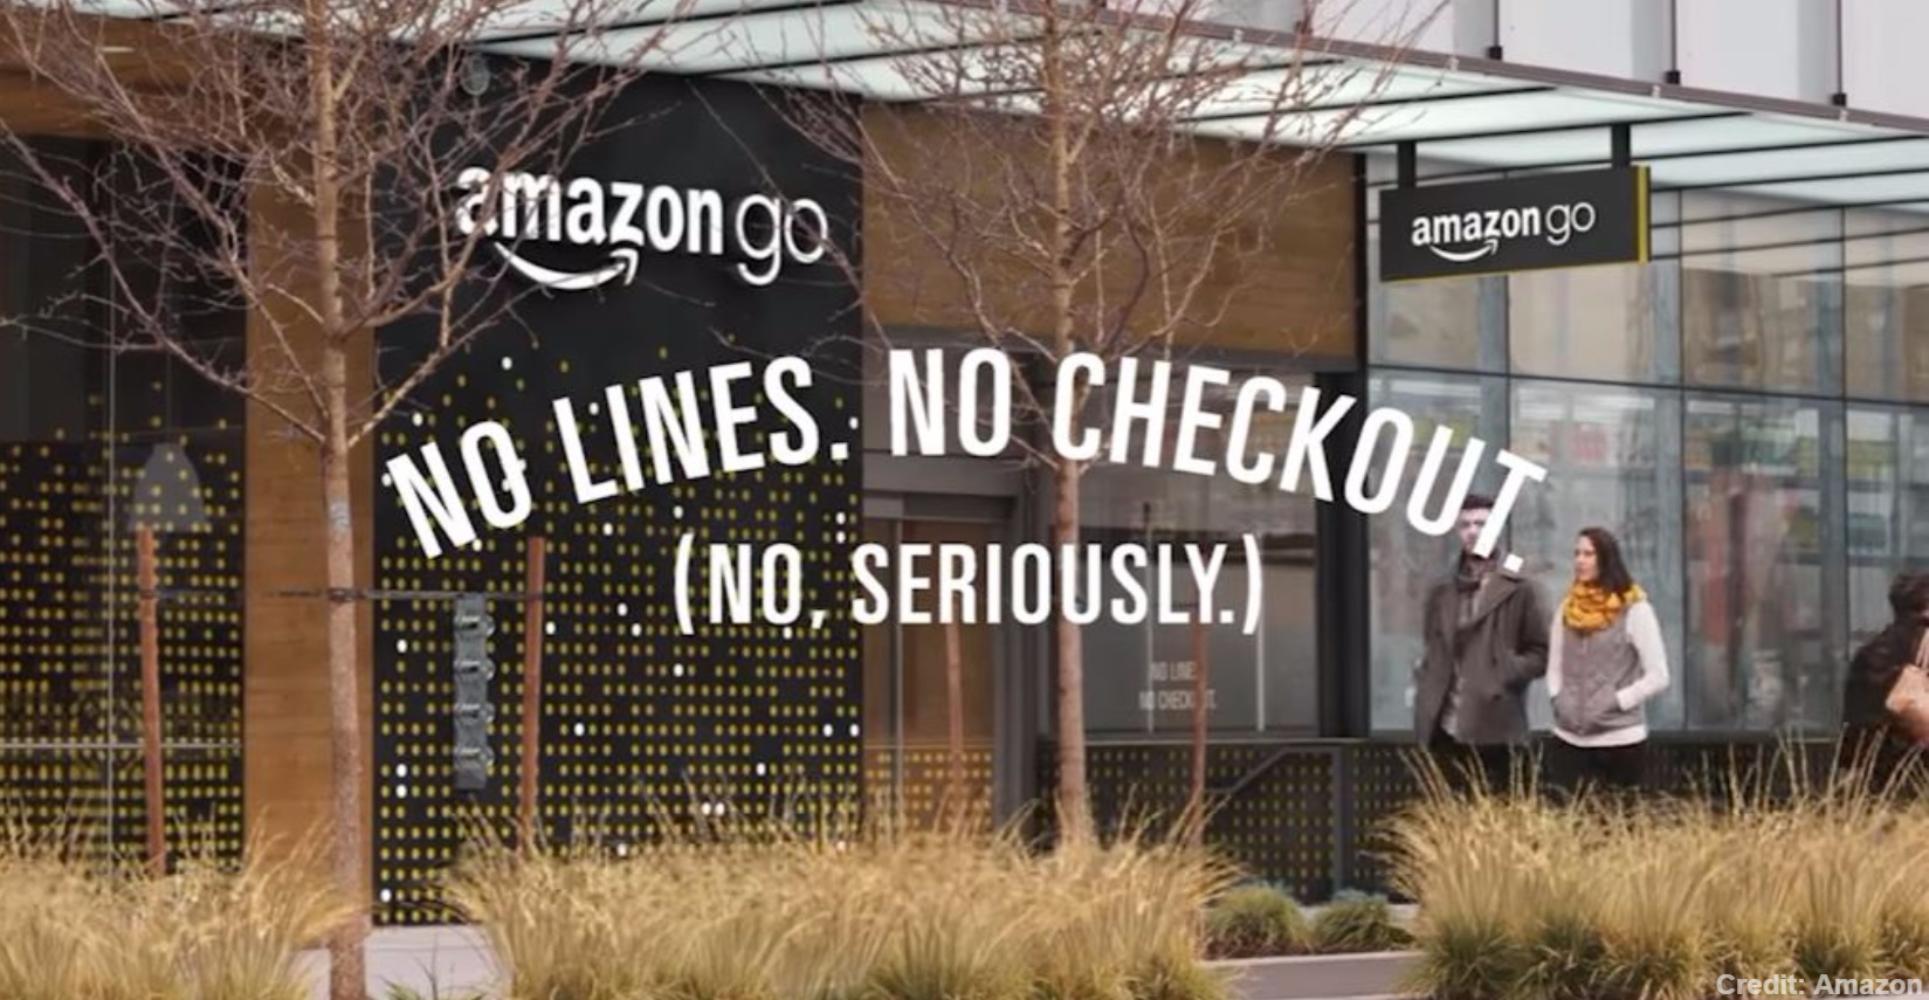 screen-capture of Amazon Go advert